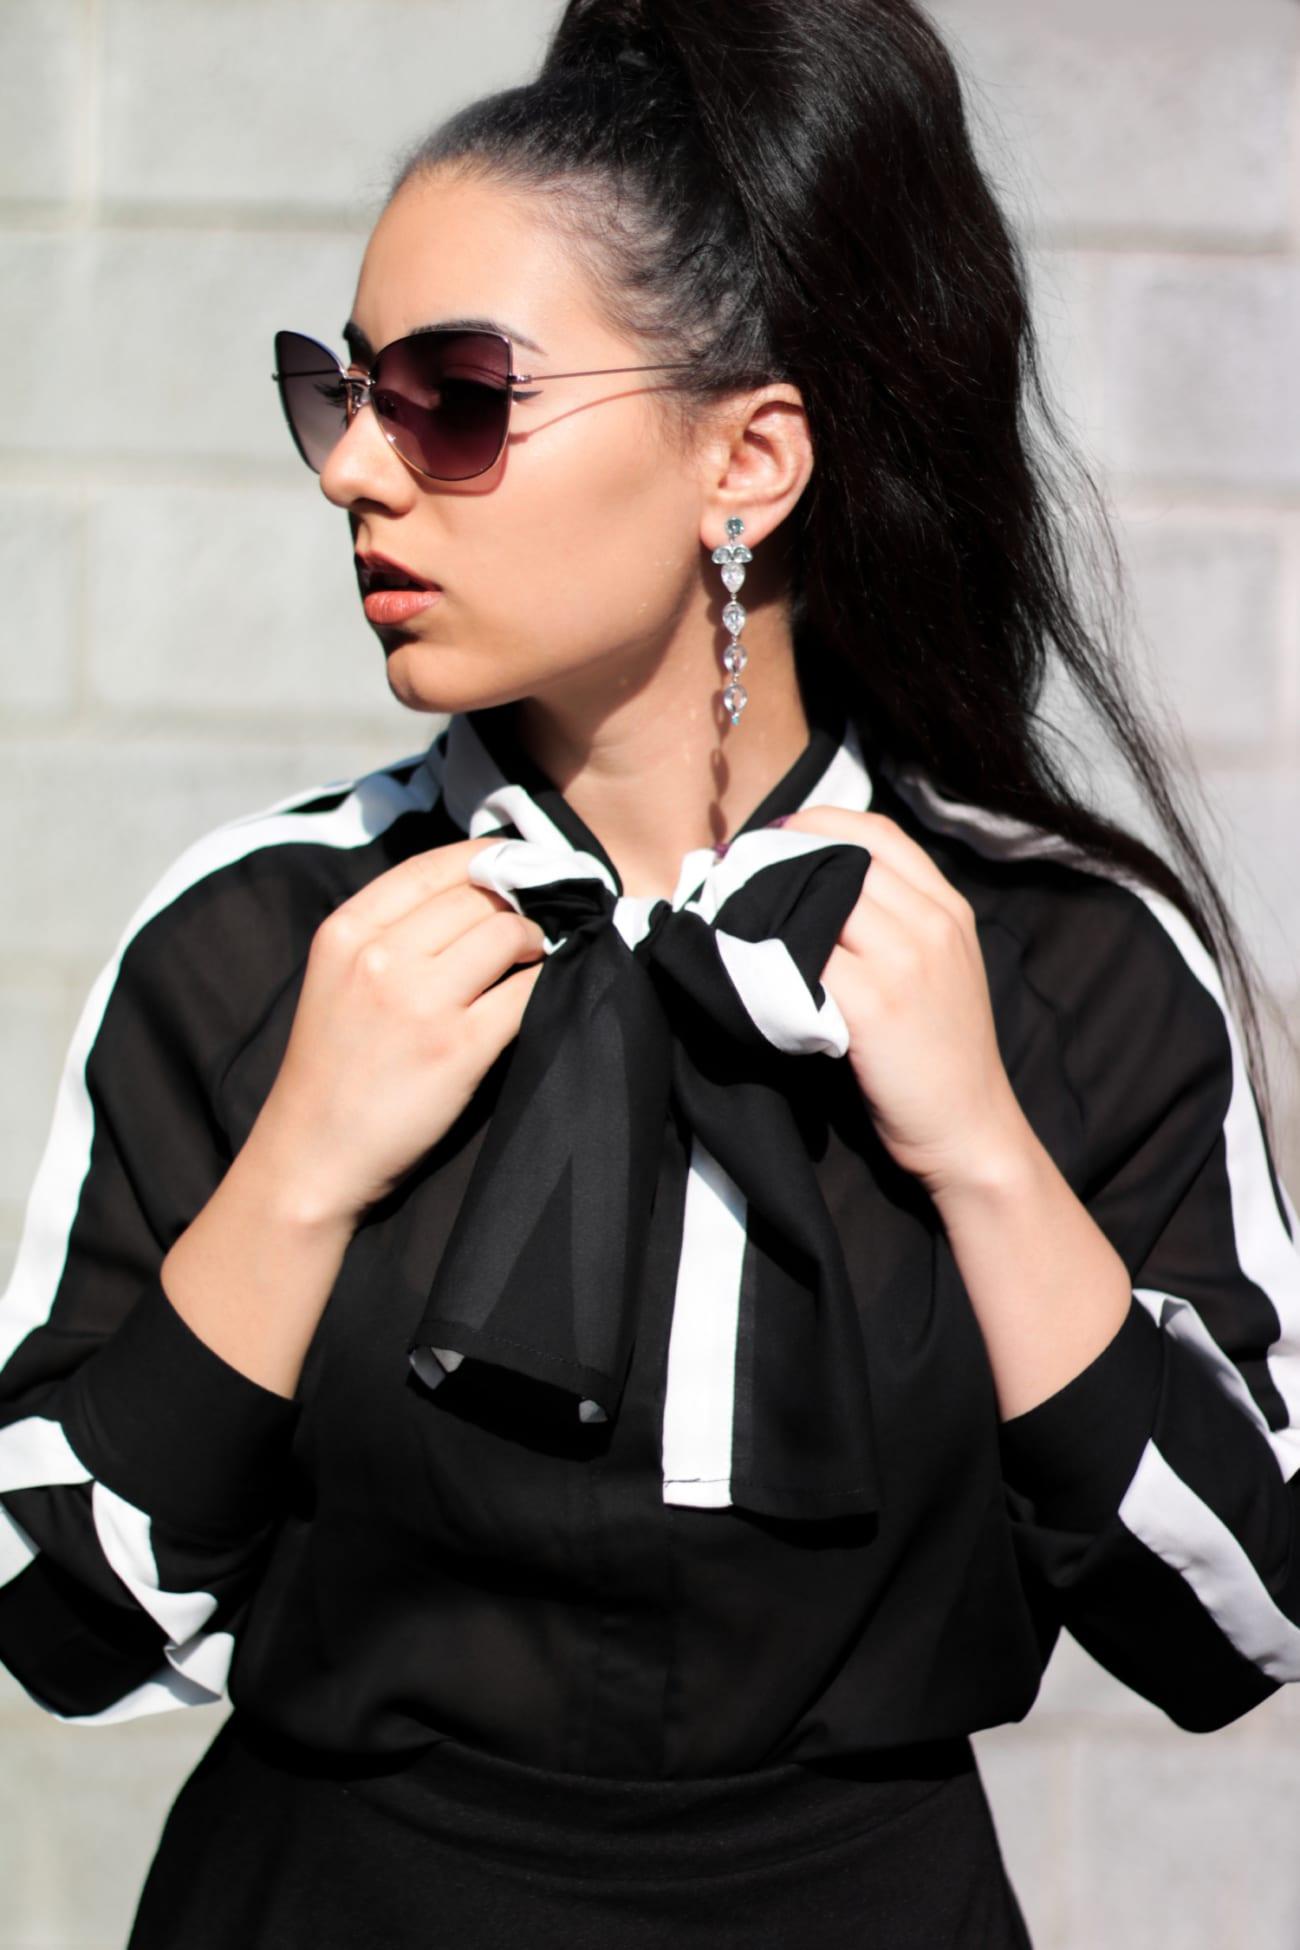 black white shirt camasa alb negru fontita bufanta ieftina online fashion blog outfit camasa eleganta roxi rose (7)